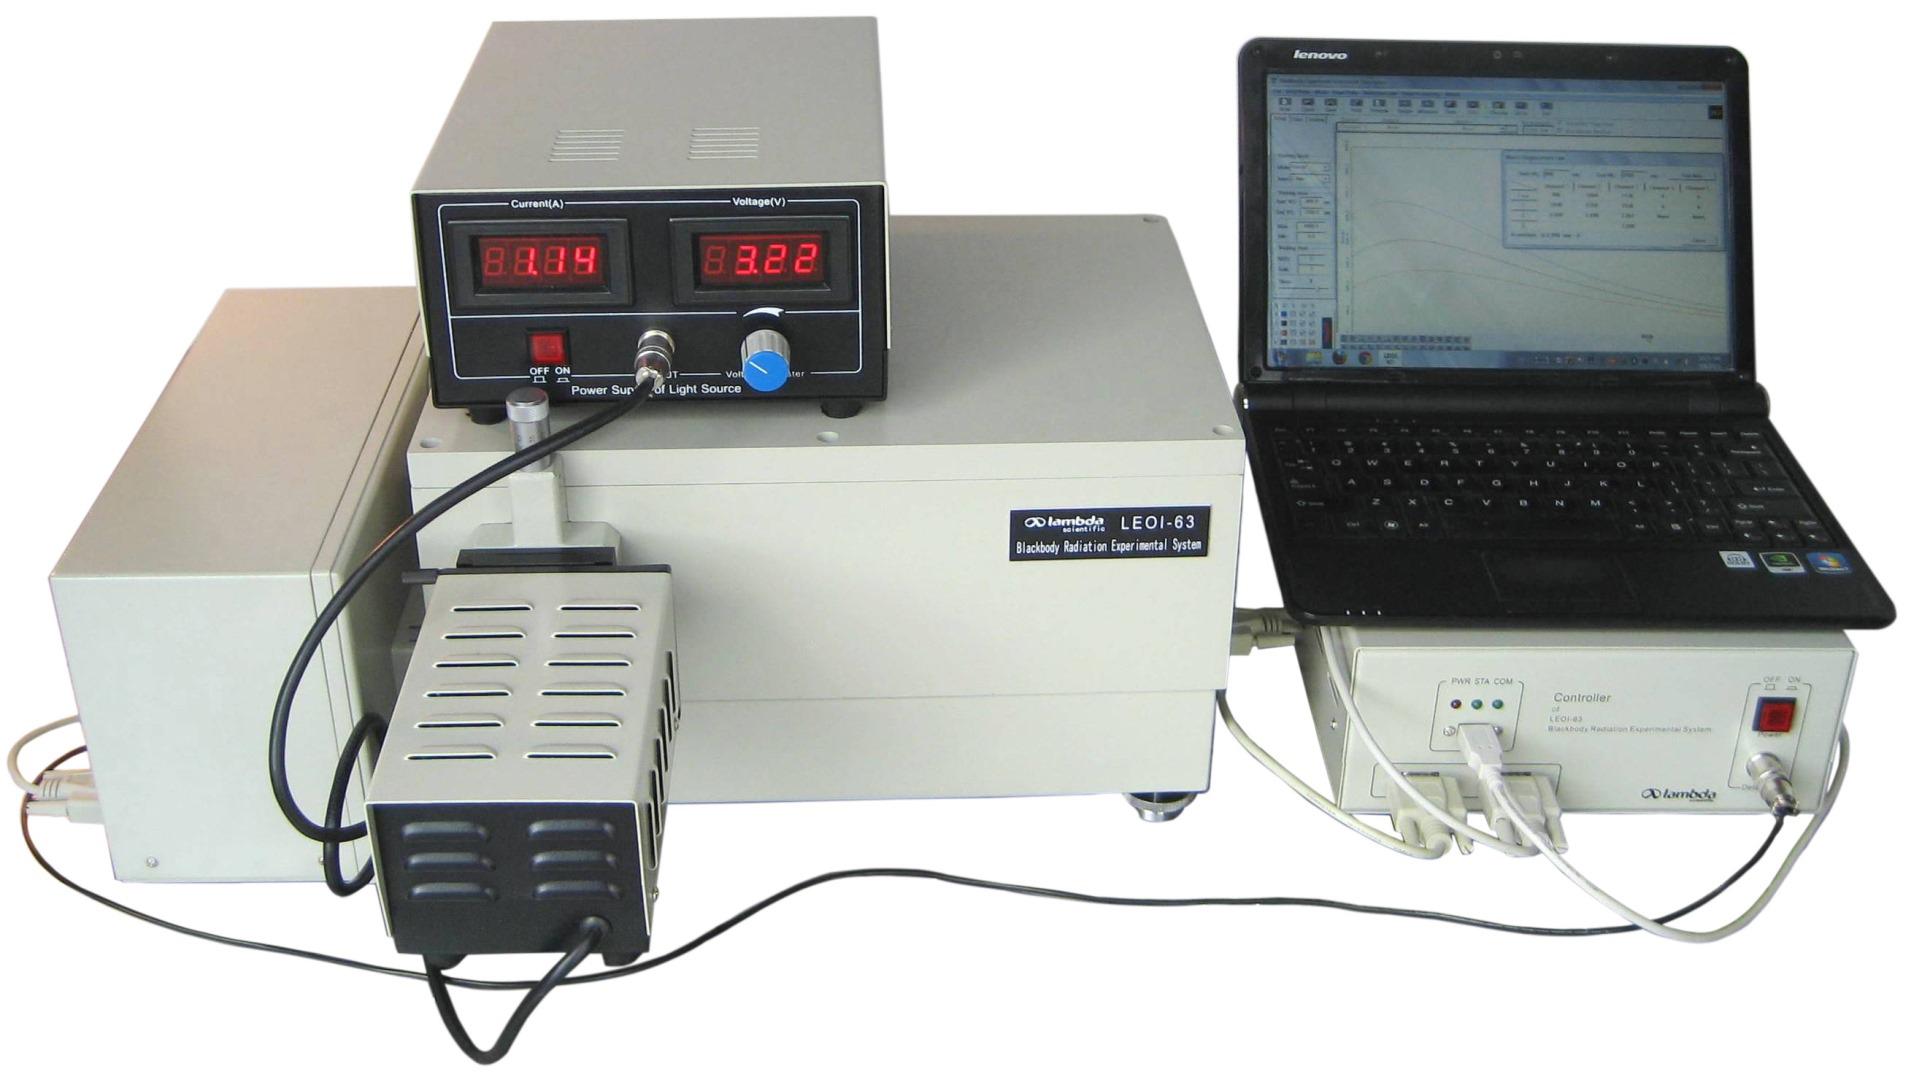 LEOI-63 Blackbody Experimental System